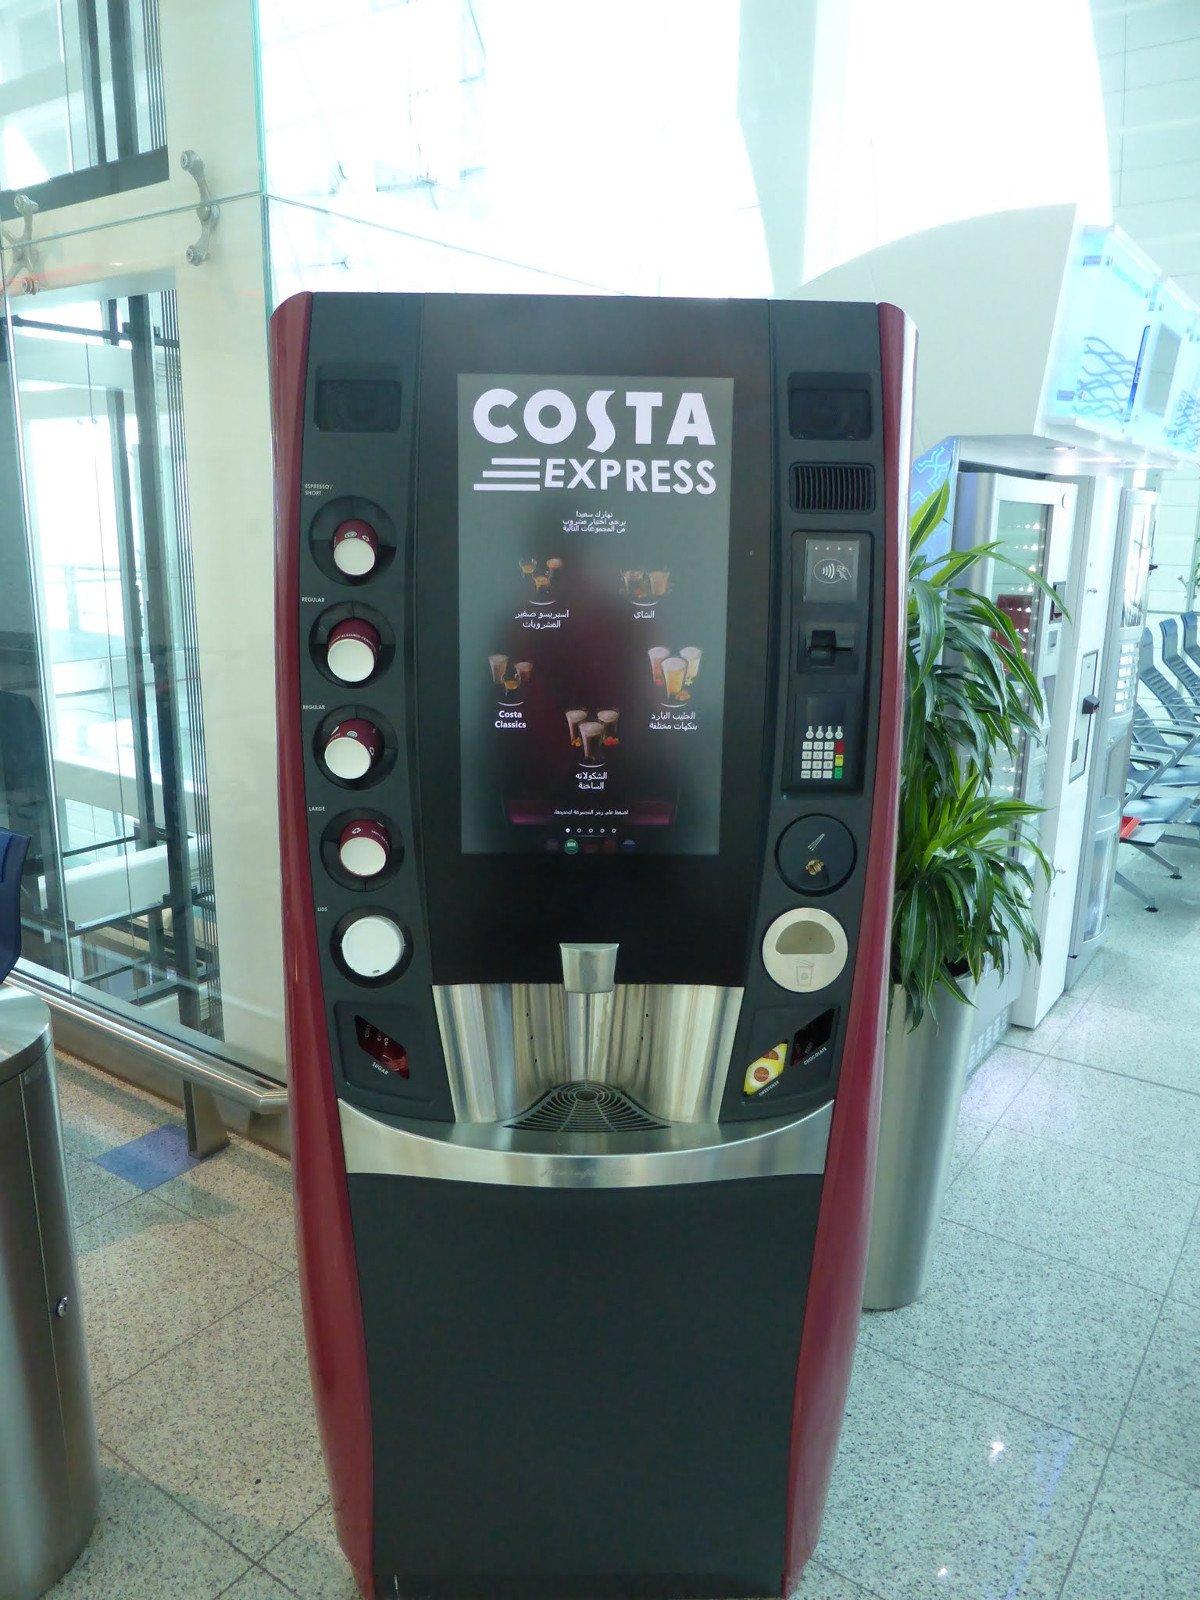 Costa Coffee Express am Flughafen Dubai (Foto: invidis)